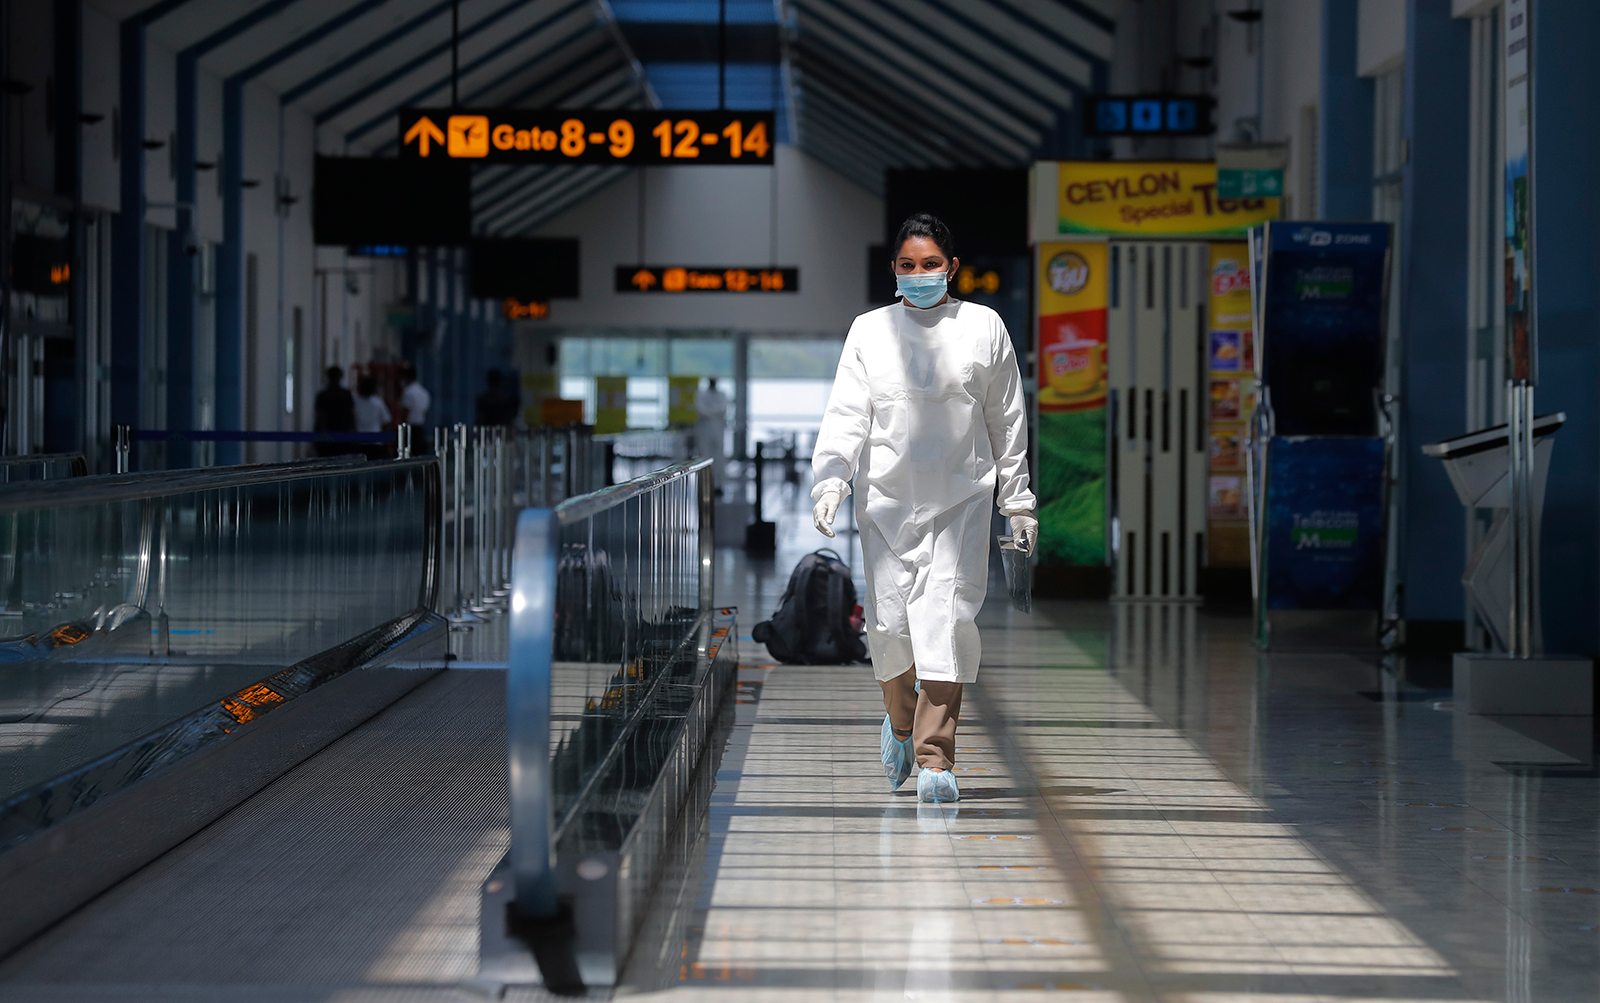 A Sri Lankan airport worker walks inside a terminal at the Katunayake International Airport in Colombo, Sri Lanka, on January 20.